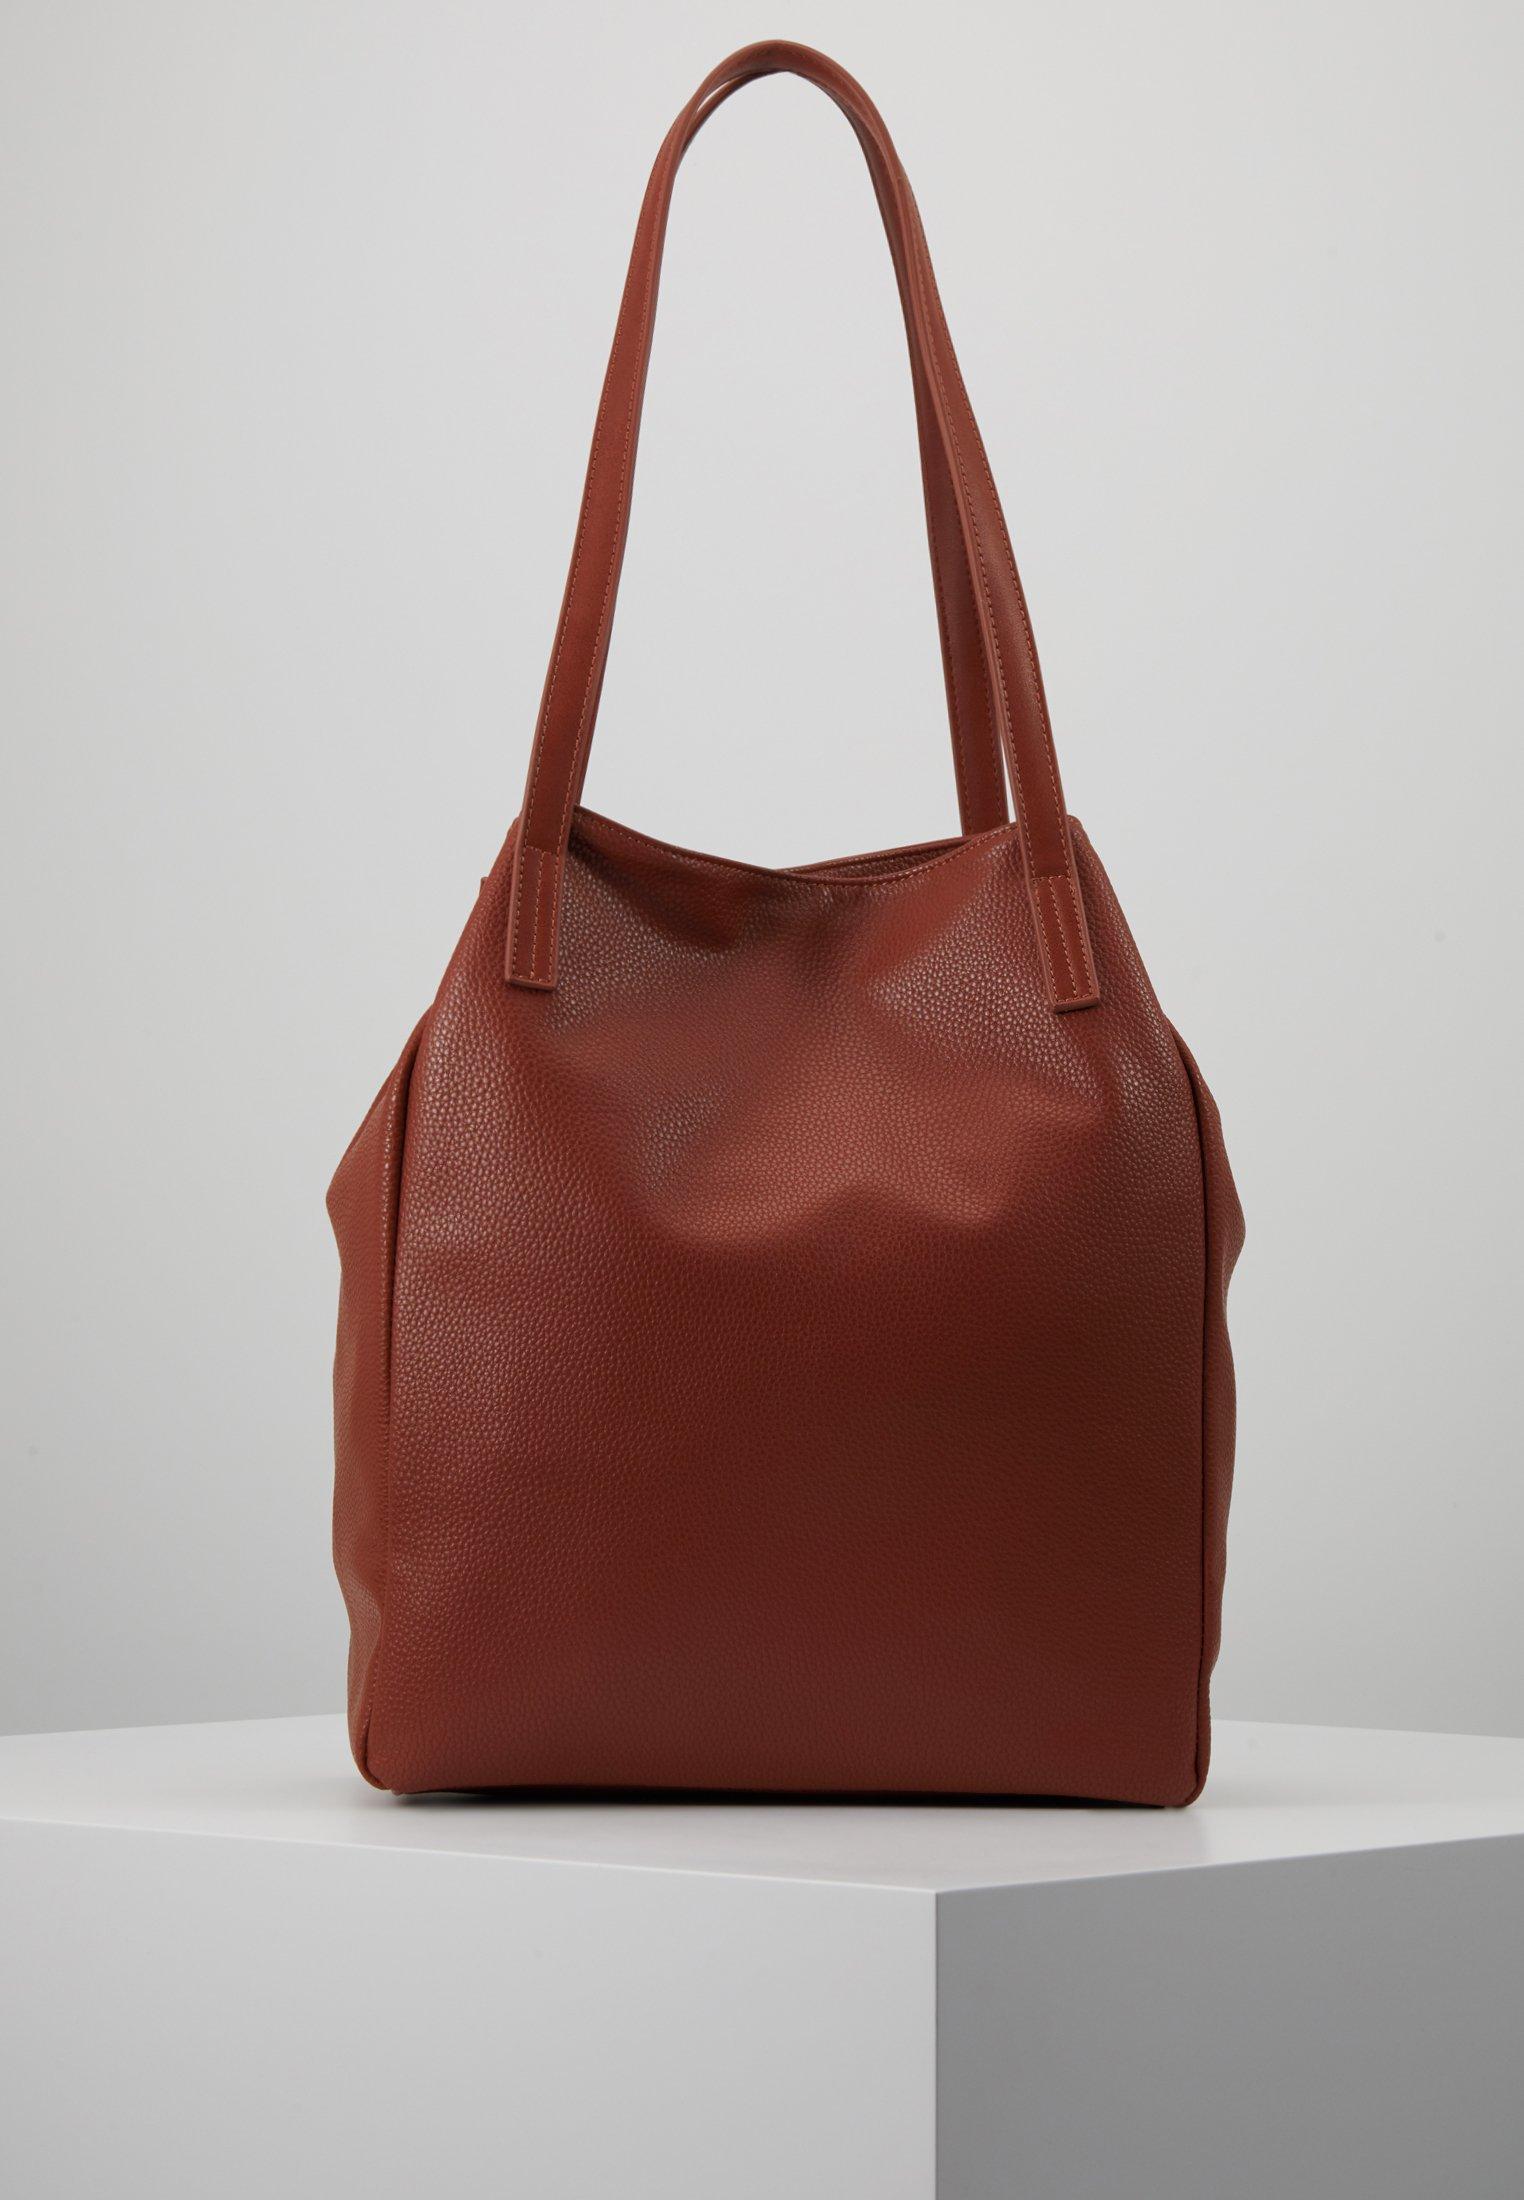 Bulk Designs Pre Order Accessories TOM TAILOR DENIM ARONA Tote bag cognac S0afcL5TZ WqKzGjdGt